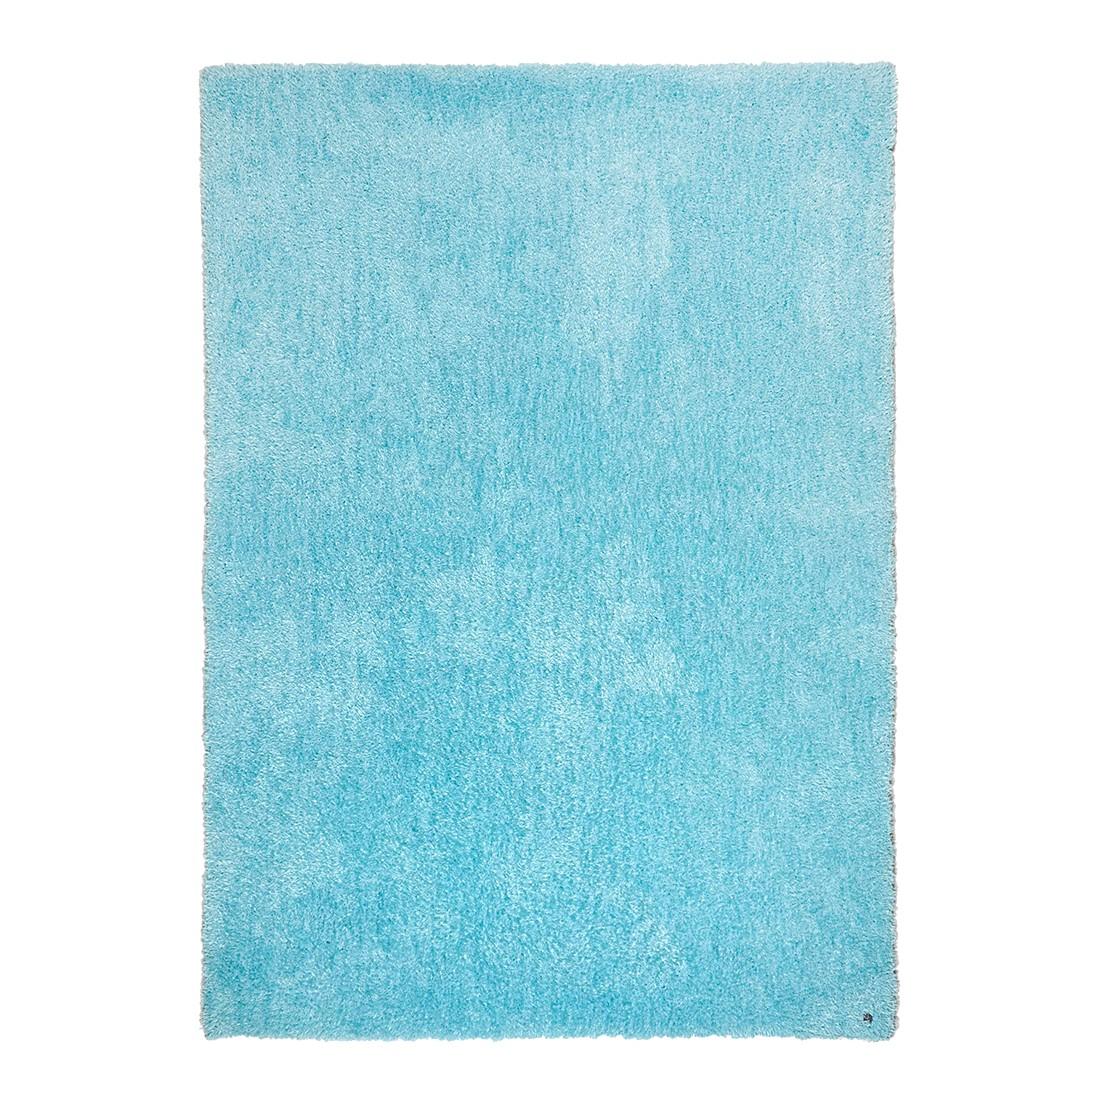 Tapijt Soft Square II - zeeblauw Round maat: 190x190cm, Tom Tailor